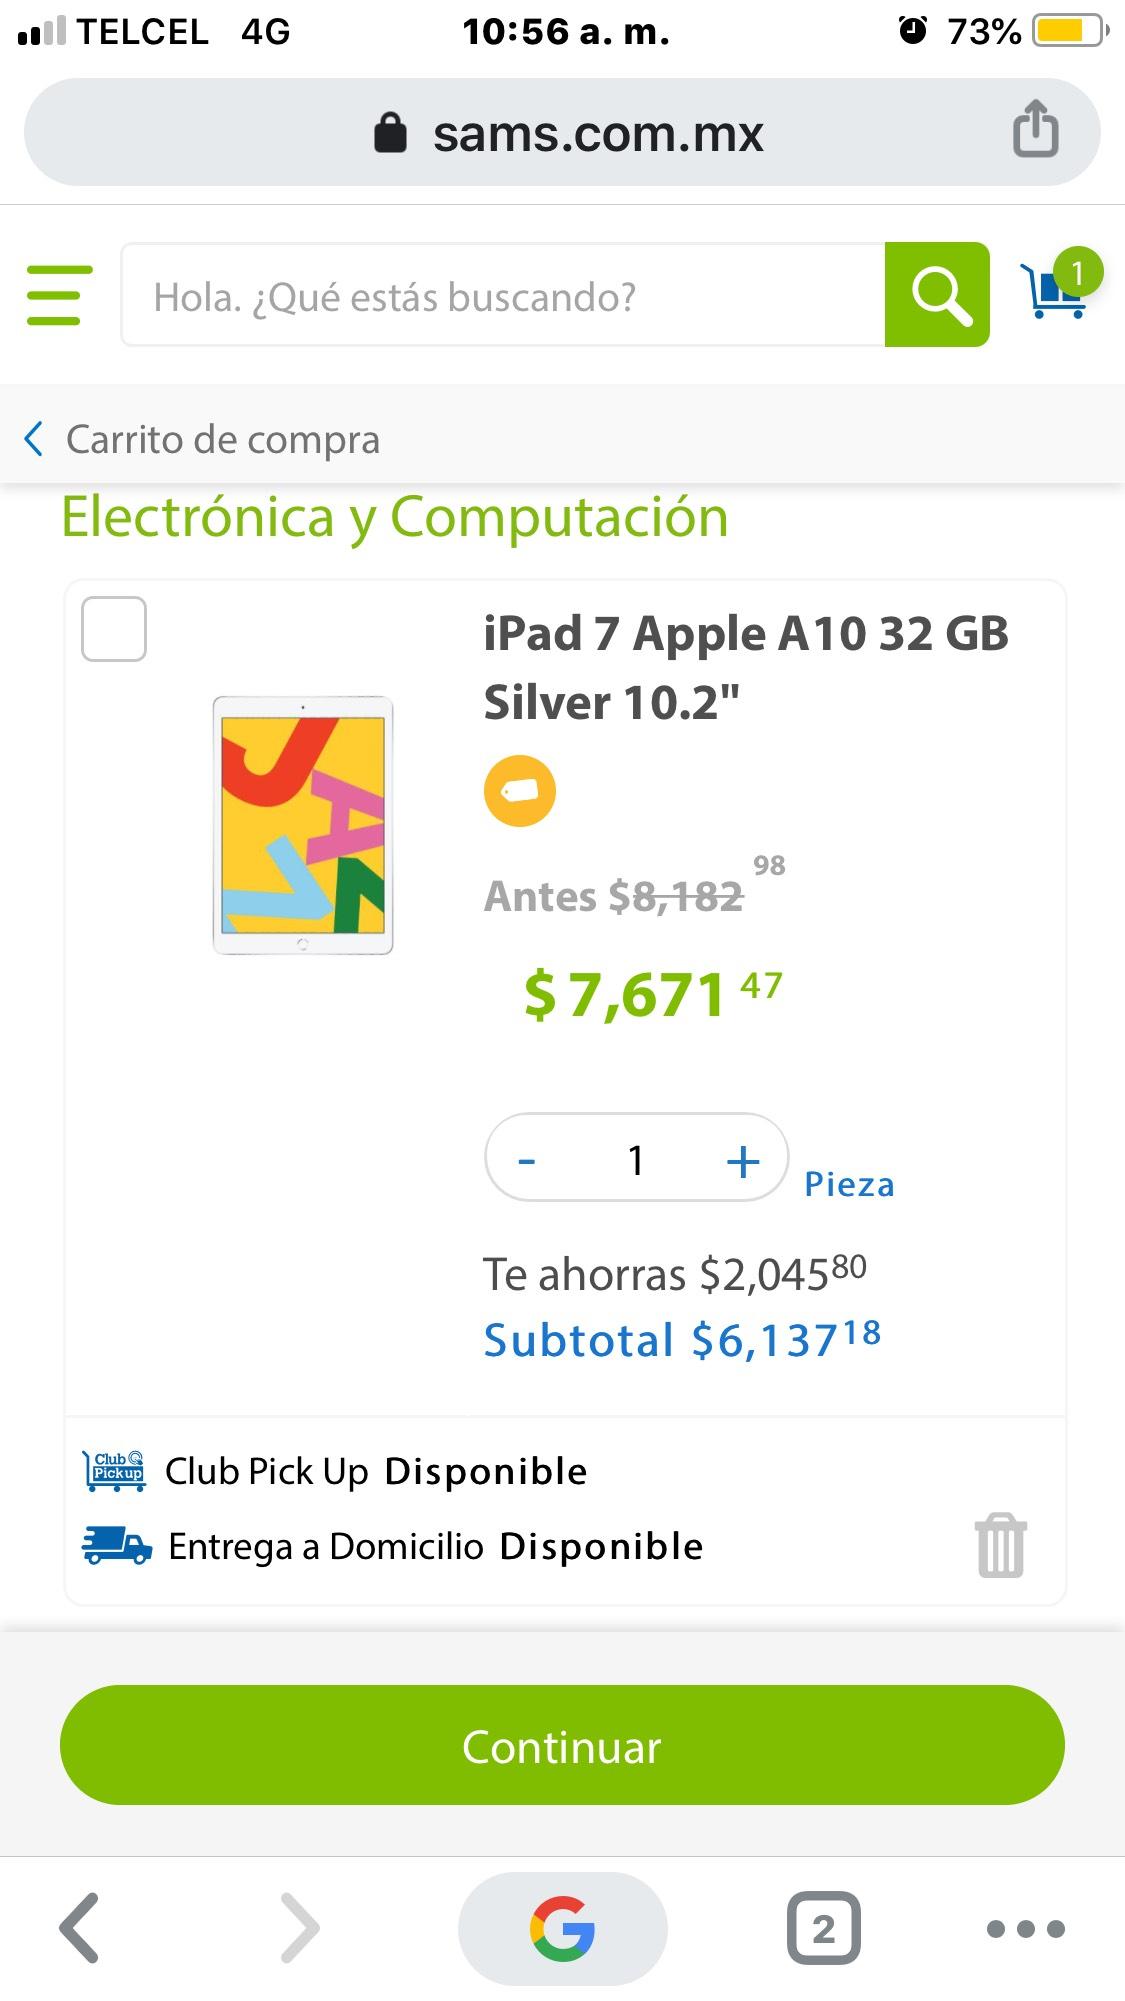 "Sam's Club: iPad 7 Apple A10 32 gb space gray 10.2"" (pagando con Sam's Inbursa)"